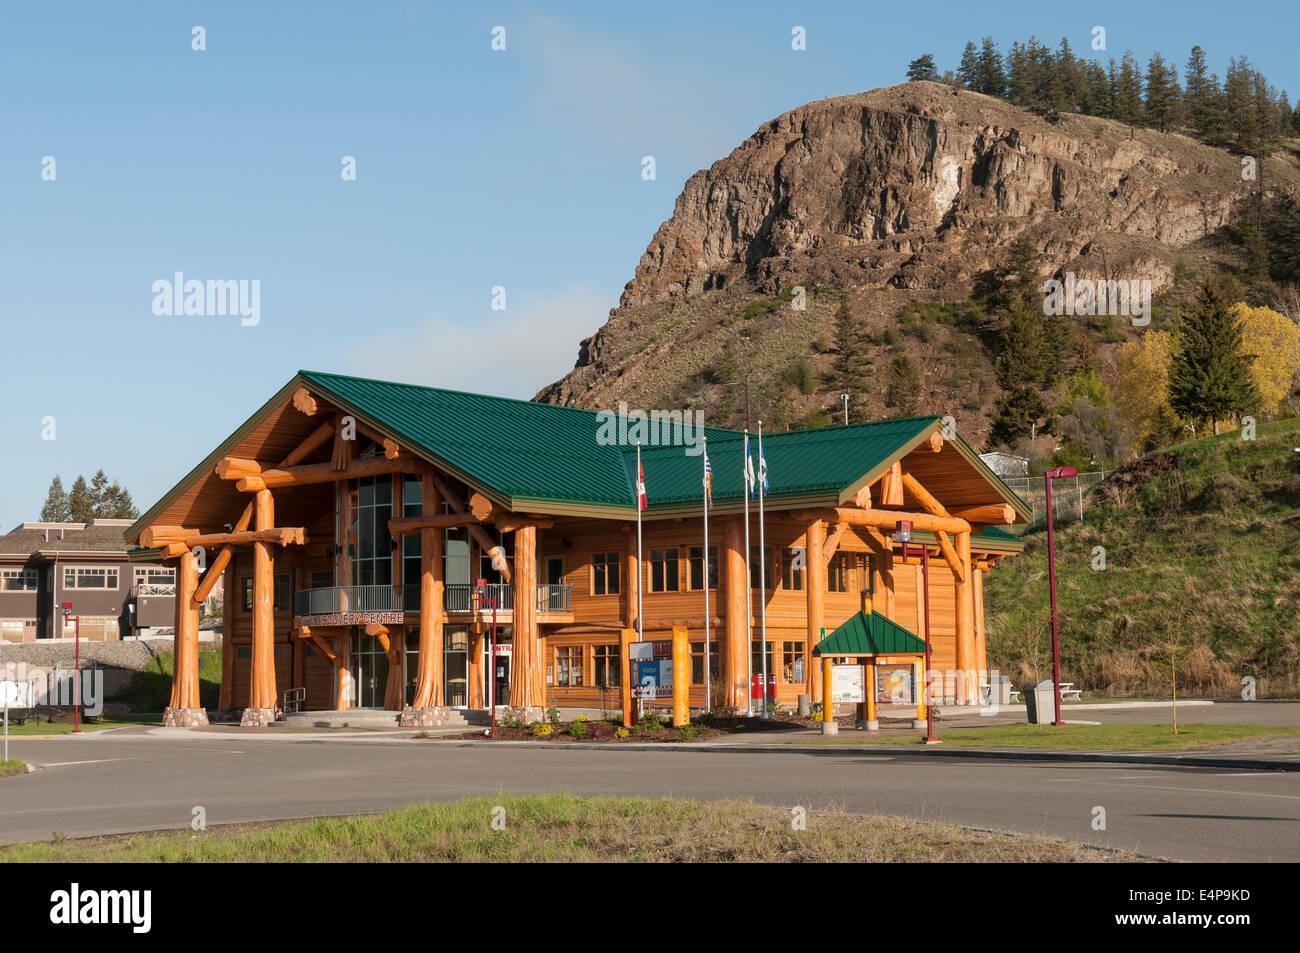 Elk203-3138 Kanada, Britisch-Kolumbien, Williams Lake, Tourismus Discovery Center Stockbild